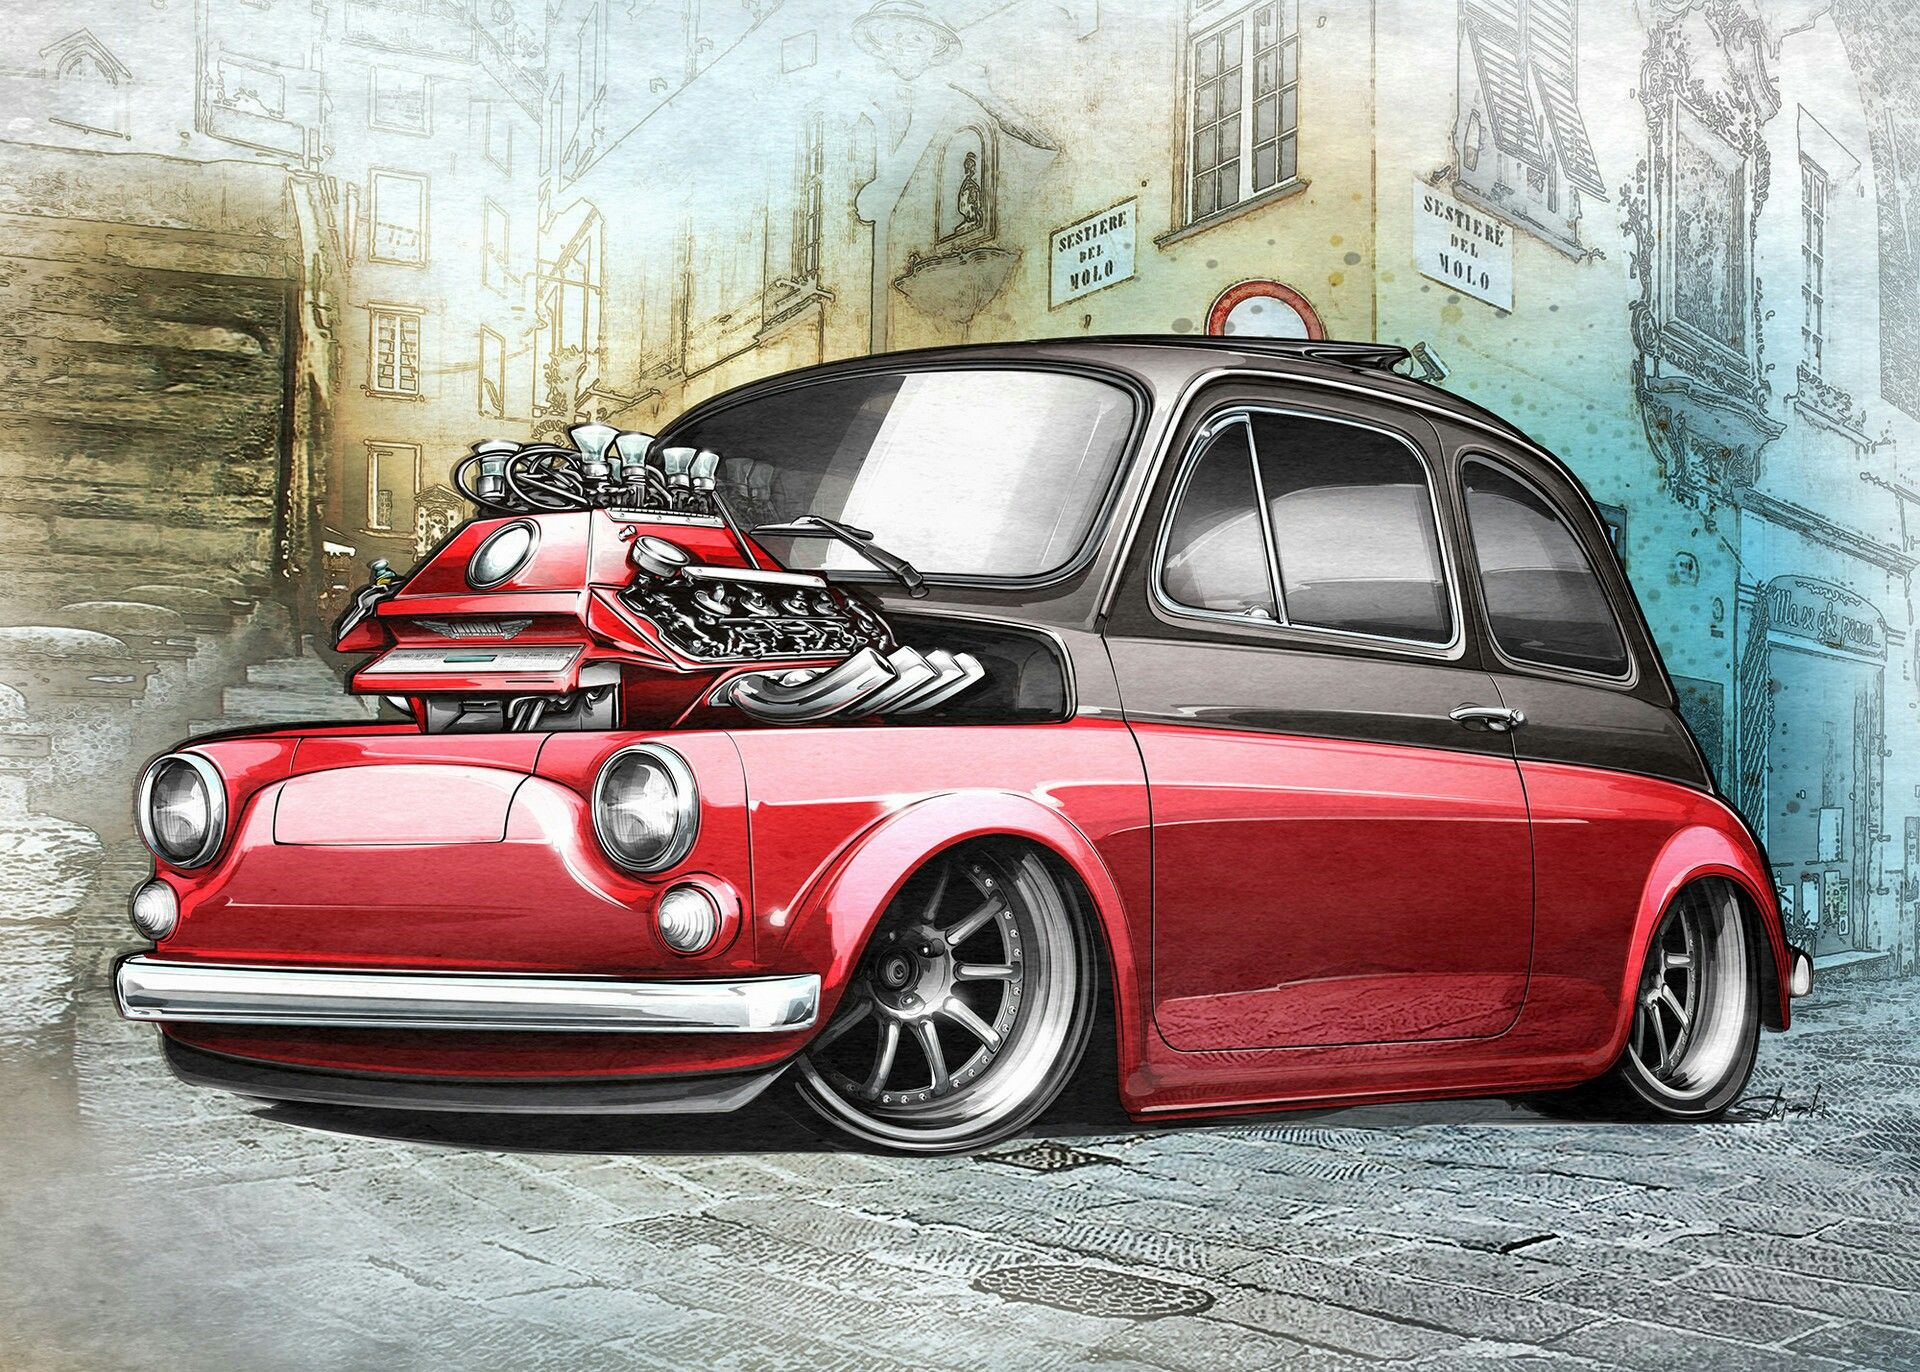 Pin by Vasilios Aivazoglou on C Tuning Car Style Art